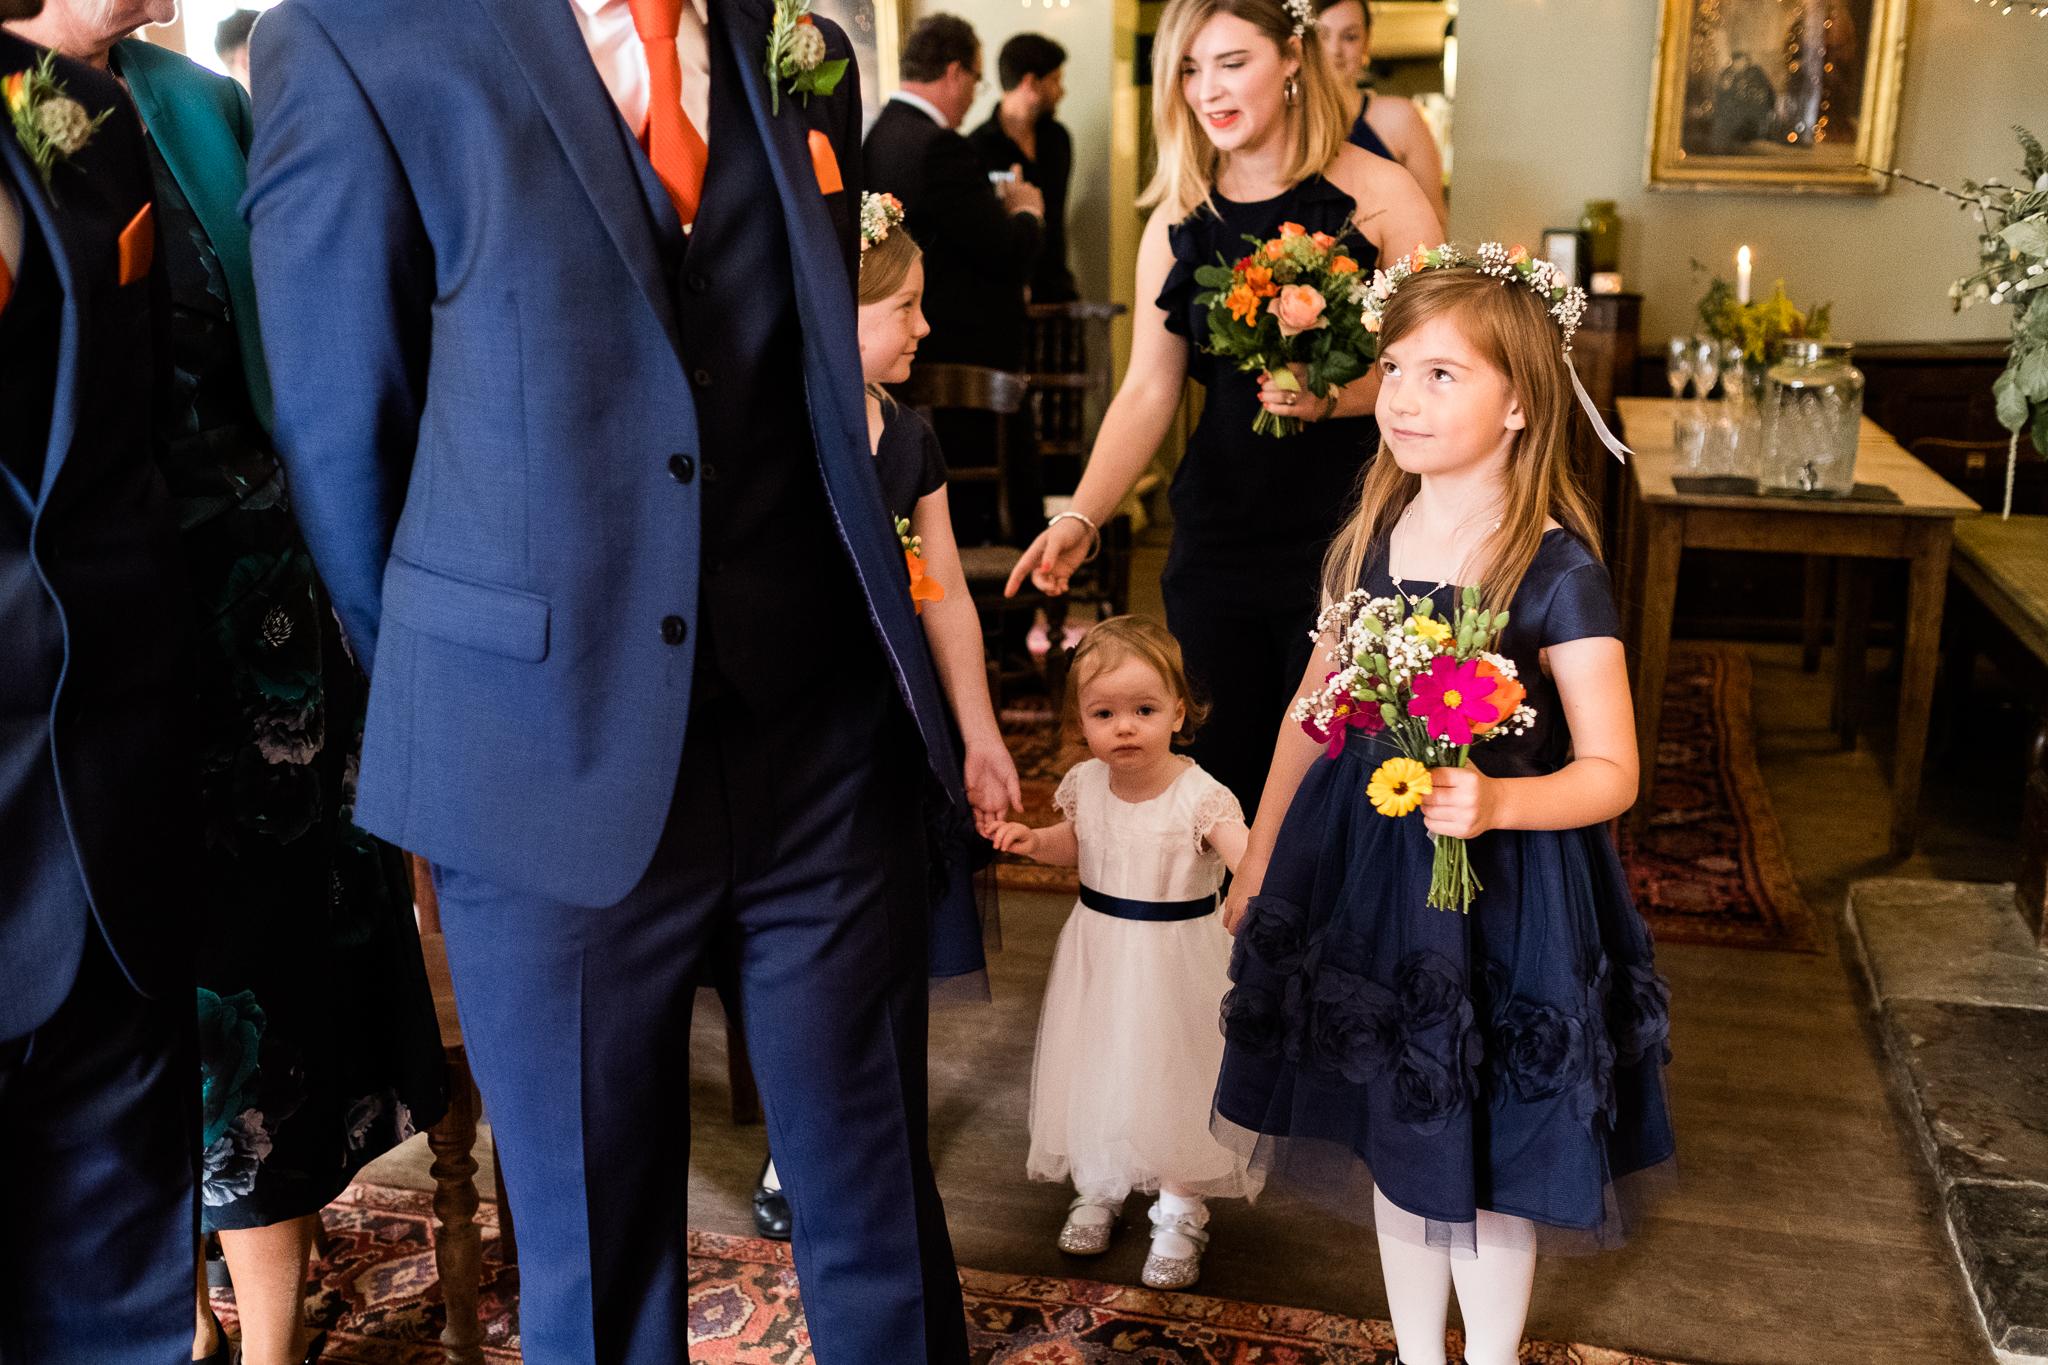 Relaxed Documentary Wedding Photography at The Wizard Inn, Alderley Edge Cheshire - Jenny Harper-18.jpg